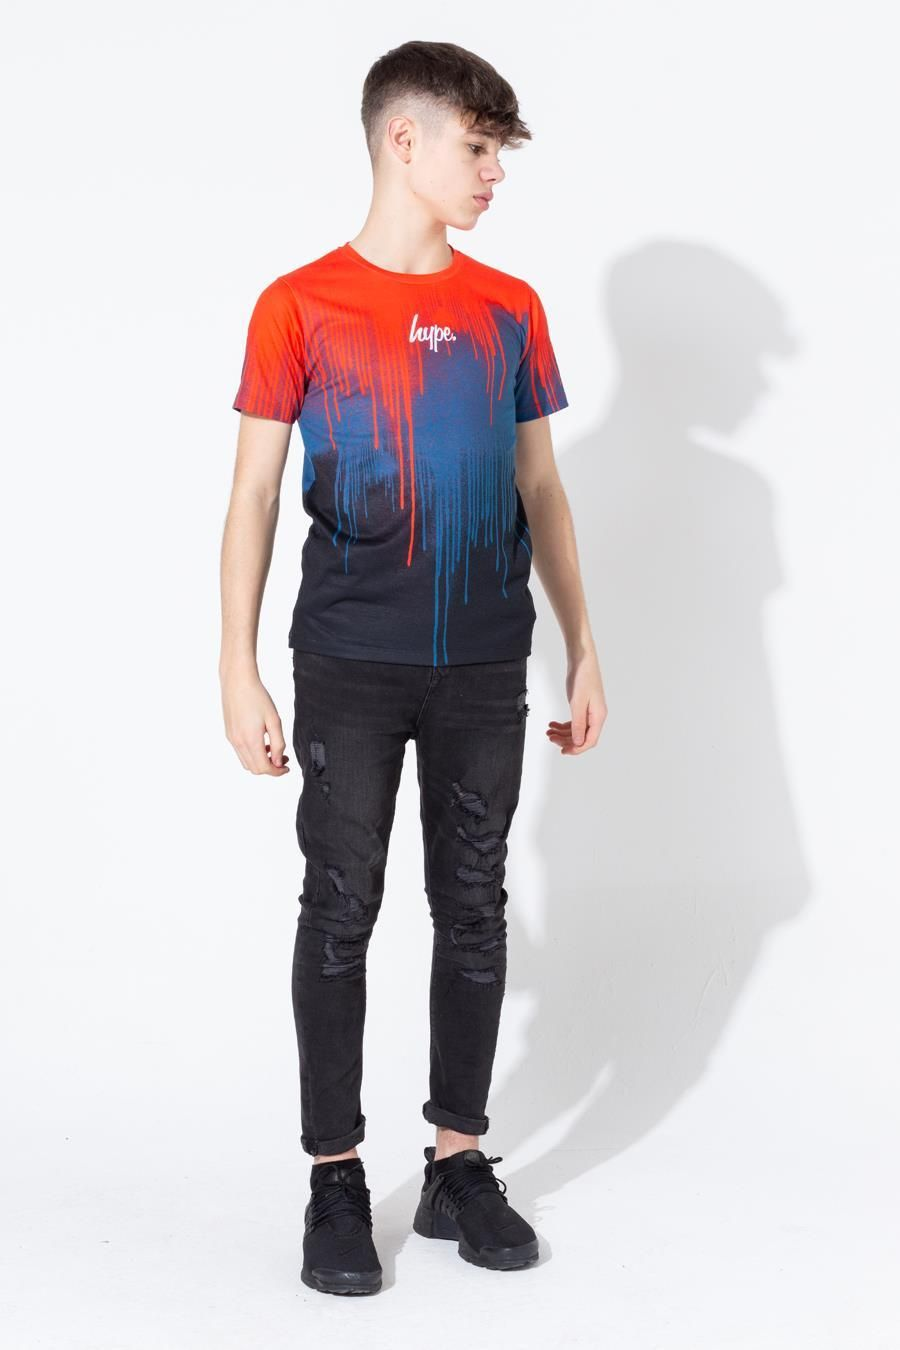 Hype Three Tone Drips Kids T-Shirt